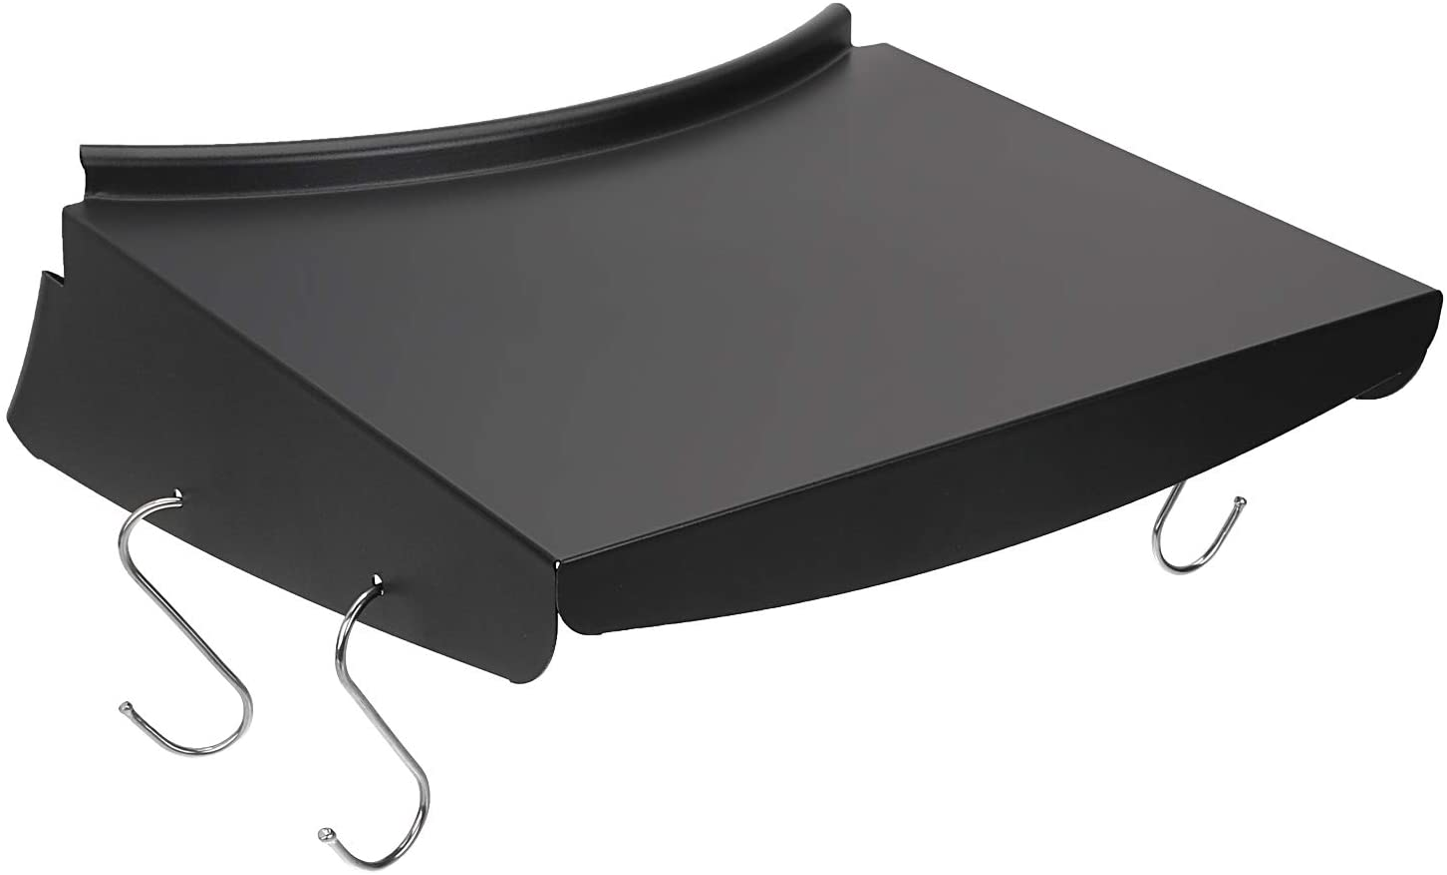 GFTIME Placa Caliente Parrilla De Mesa para 57 cm Weber Parrillas de carbón de Caldera BBQ Reemplazo